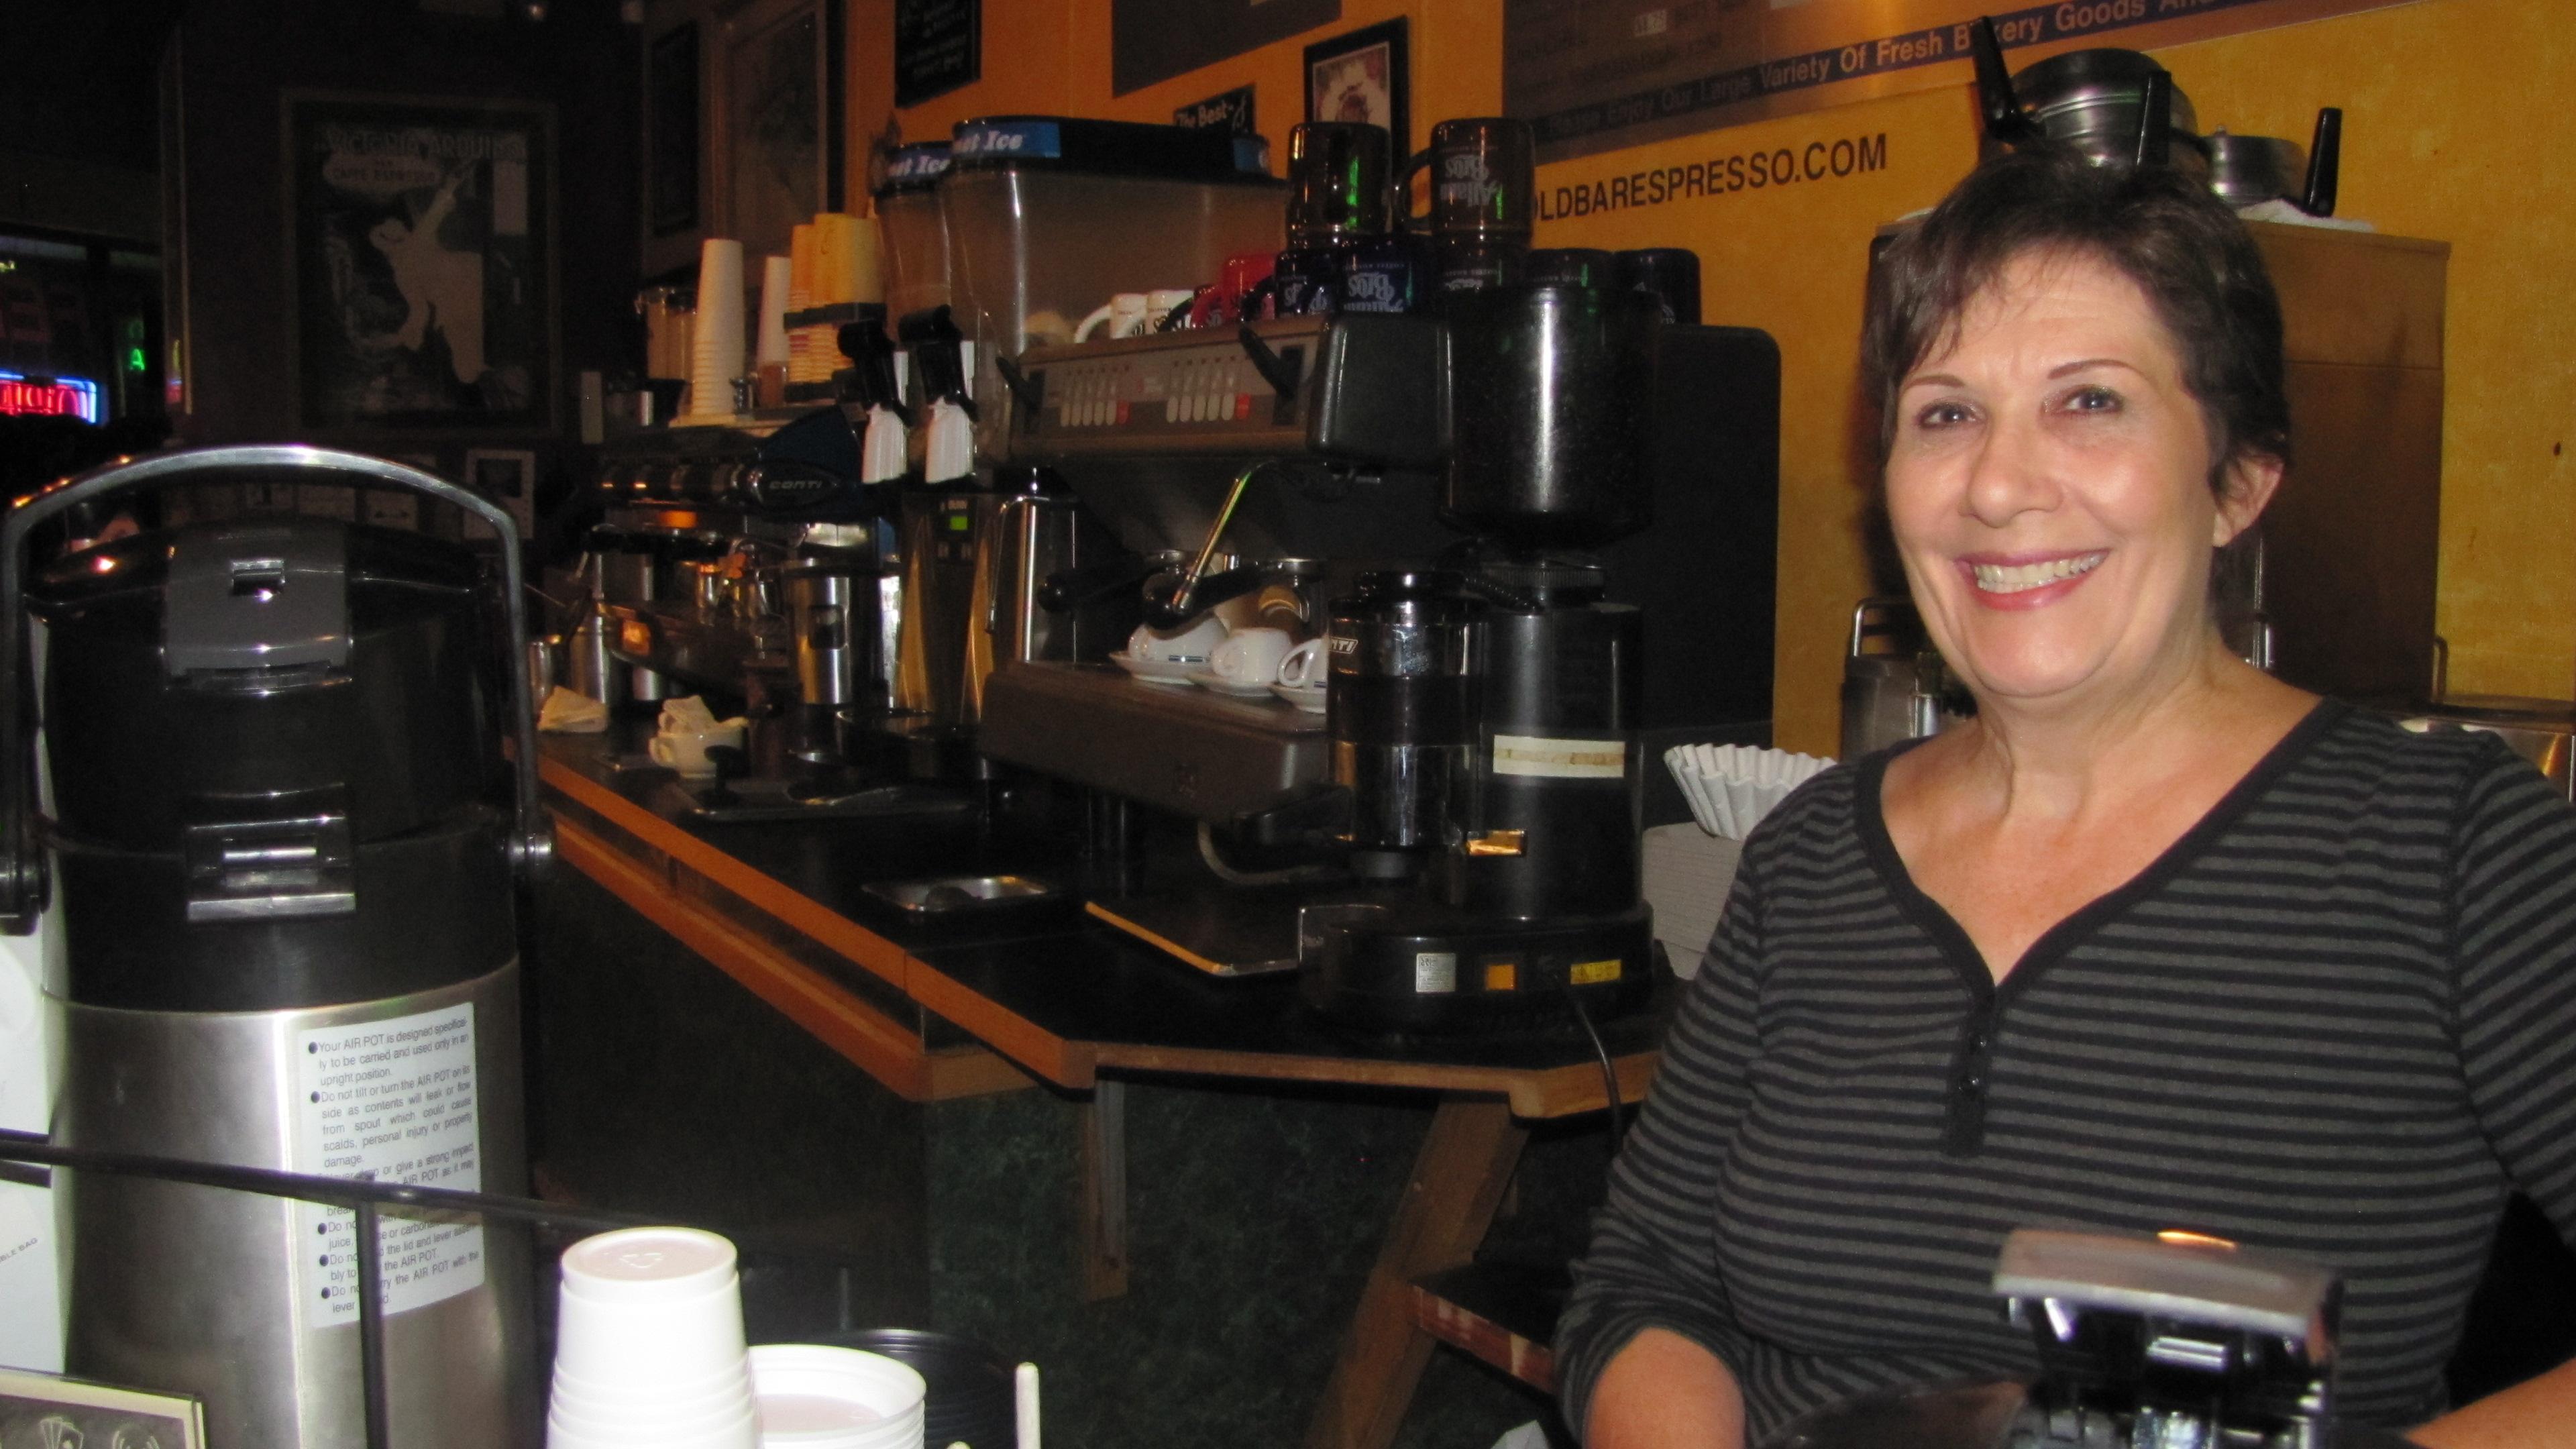 Karen Miller, Owner of Gold Bar Espresso in Tempe